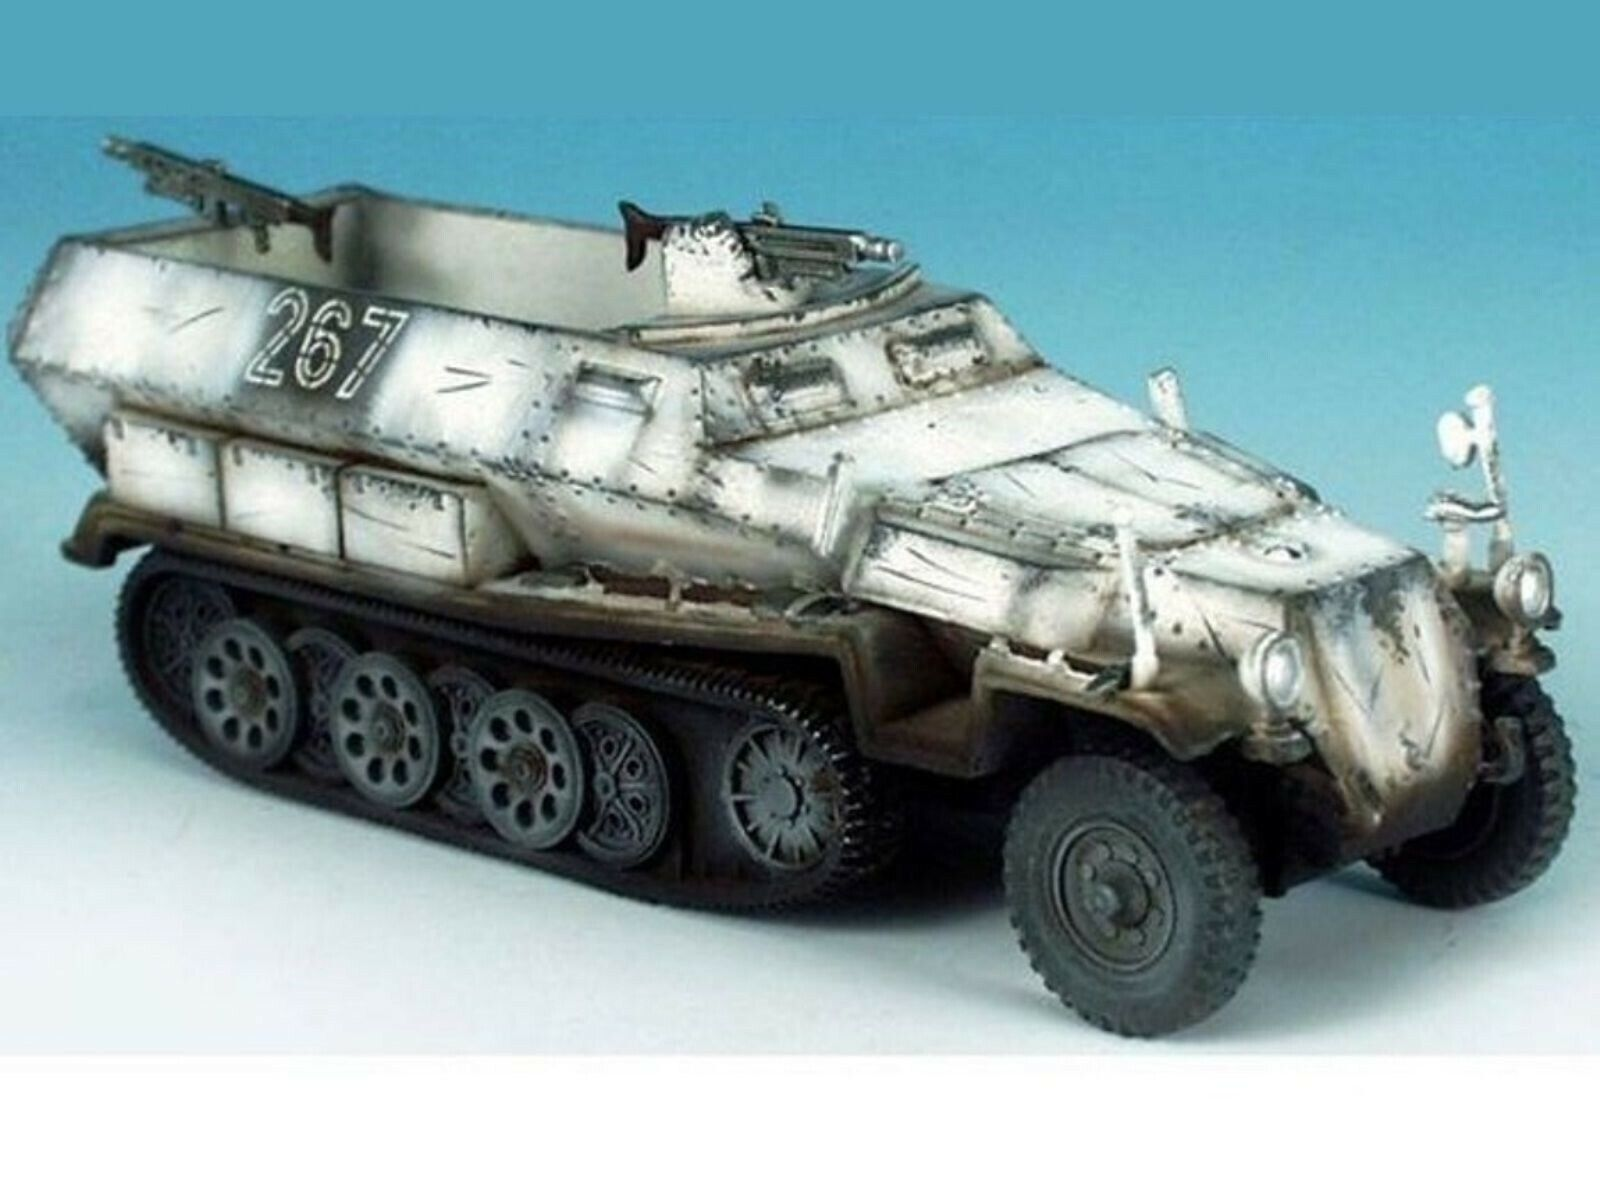 WOW EXTREMELY RARE Hanomag Sd Kfz 251 1 Winter 1944 17498D BNIB 1 32 W.Britain's